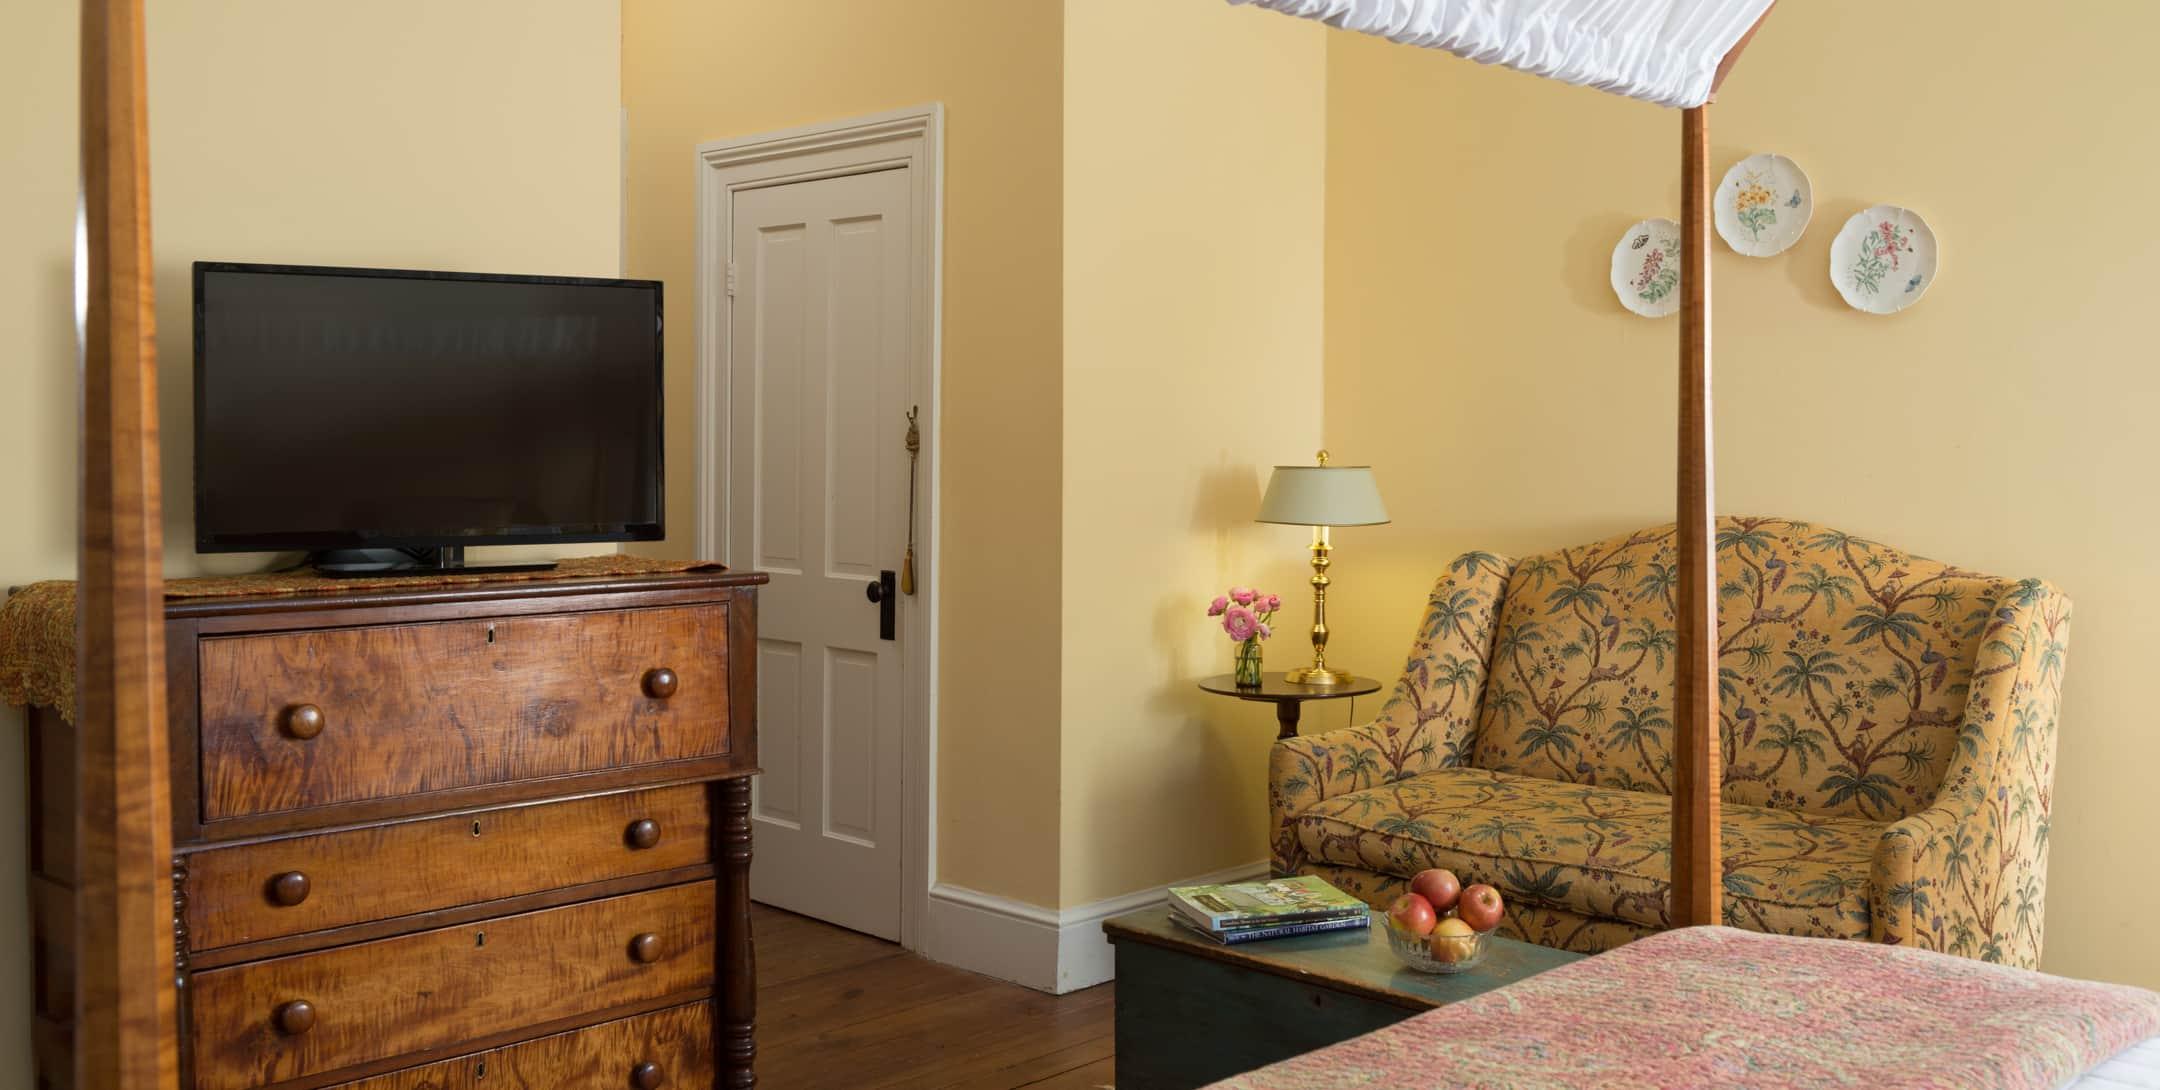 Flatscreen TV on a dresser in the Yellow Room at Brampton Inn